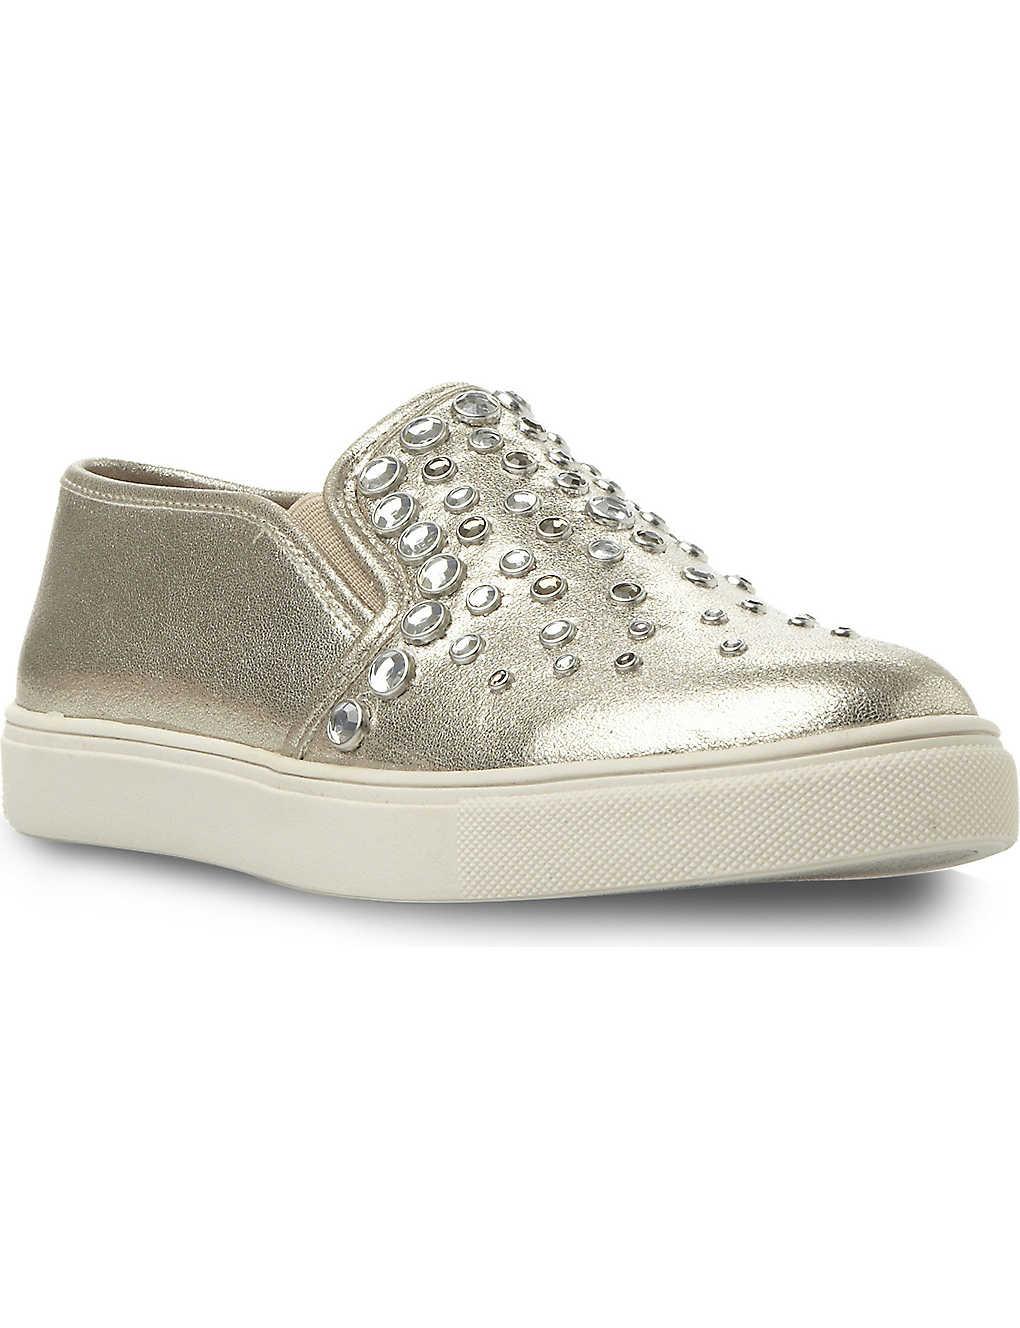 8a3b364d5ca STEVE MADDEN - Jewelled slip-on sneakers